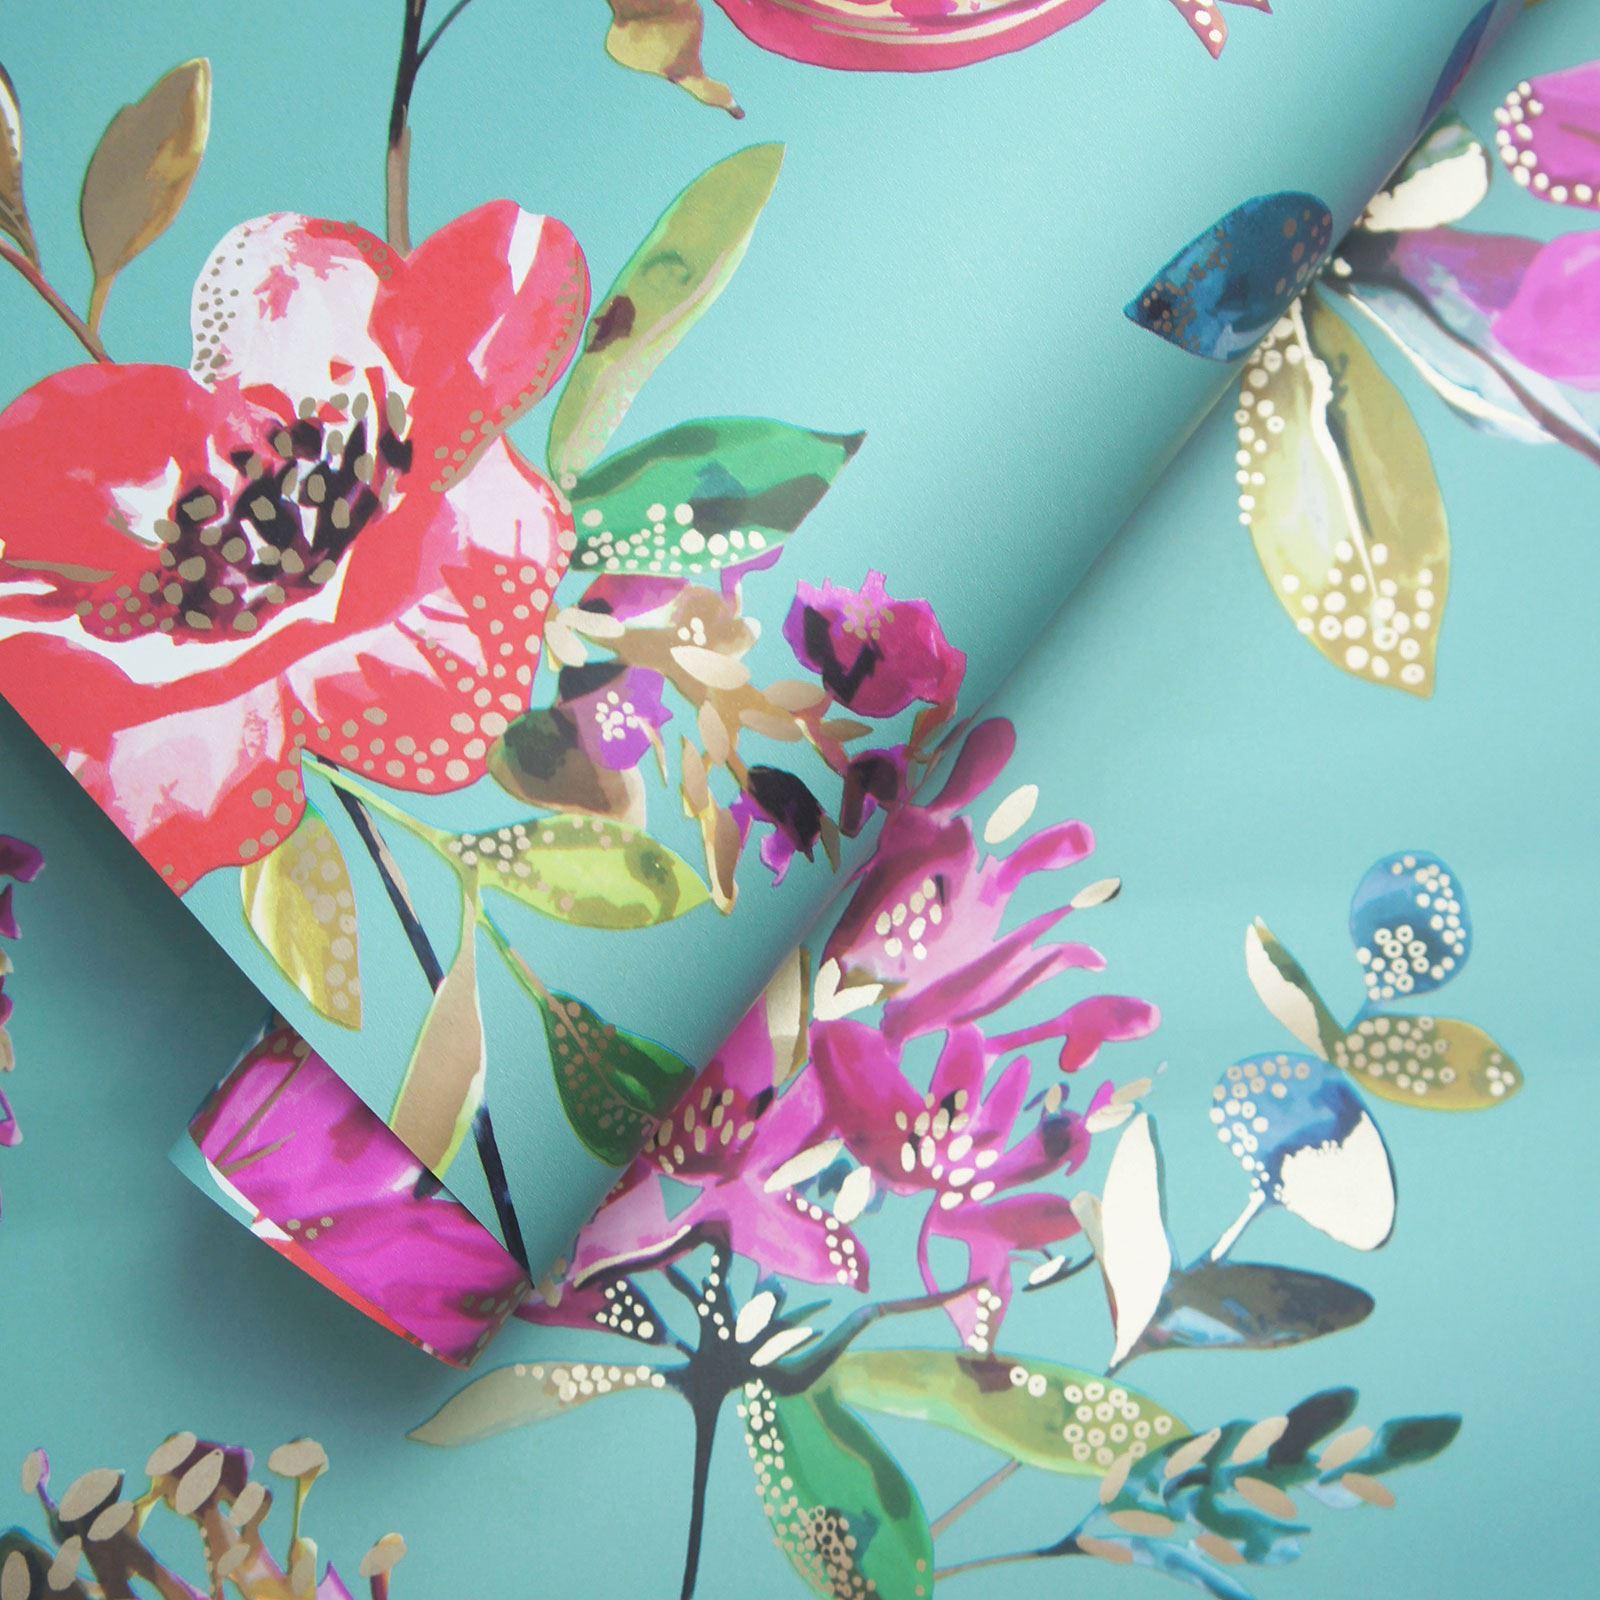 Pink Flowers Wallpaper: HOLDEN MELGRANO FLORAL WALLPAPER